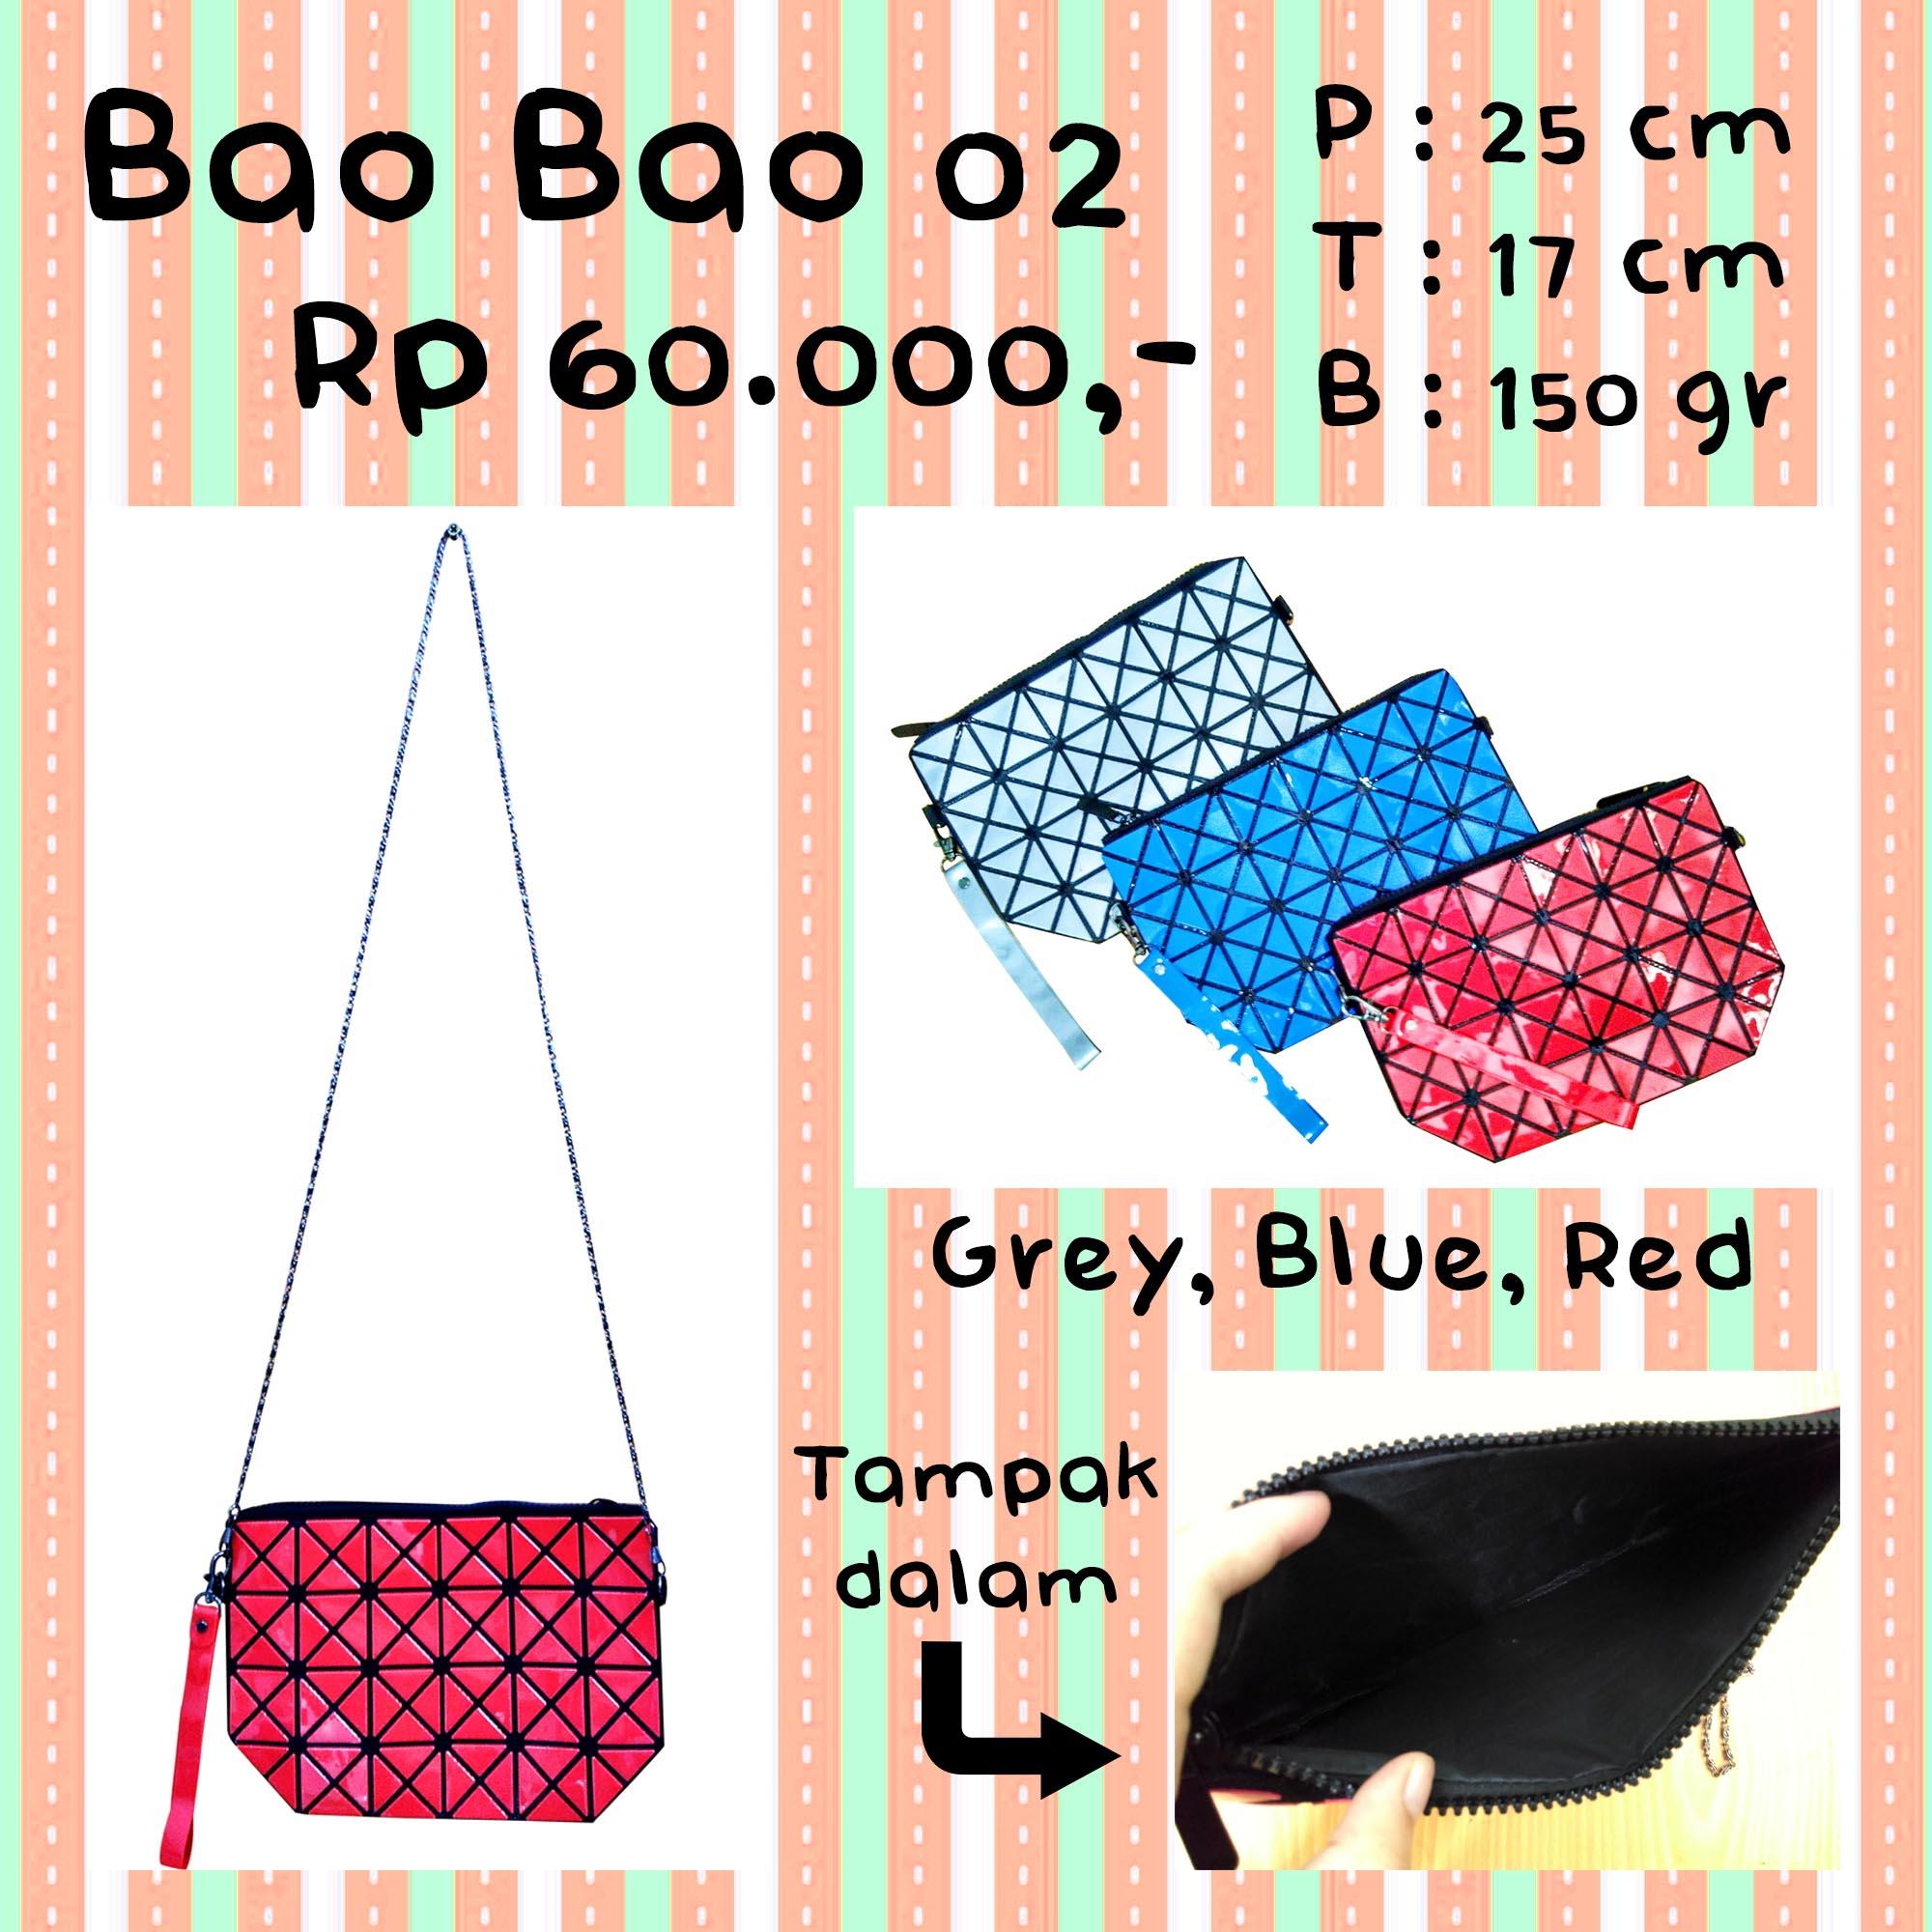 Sling bag tokopedia - Tas Wanita Cewek Bao Bao Sling Bag Paling Laku Terlaris Unik Lucu Imut